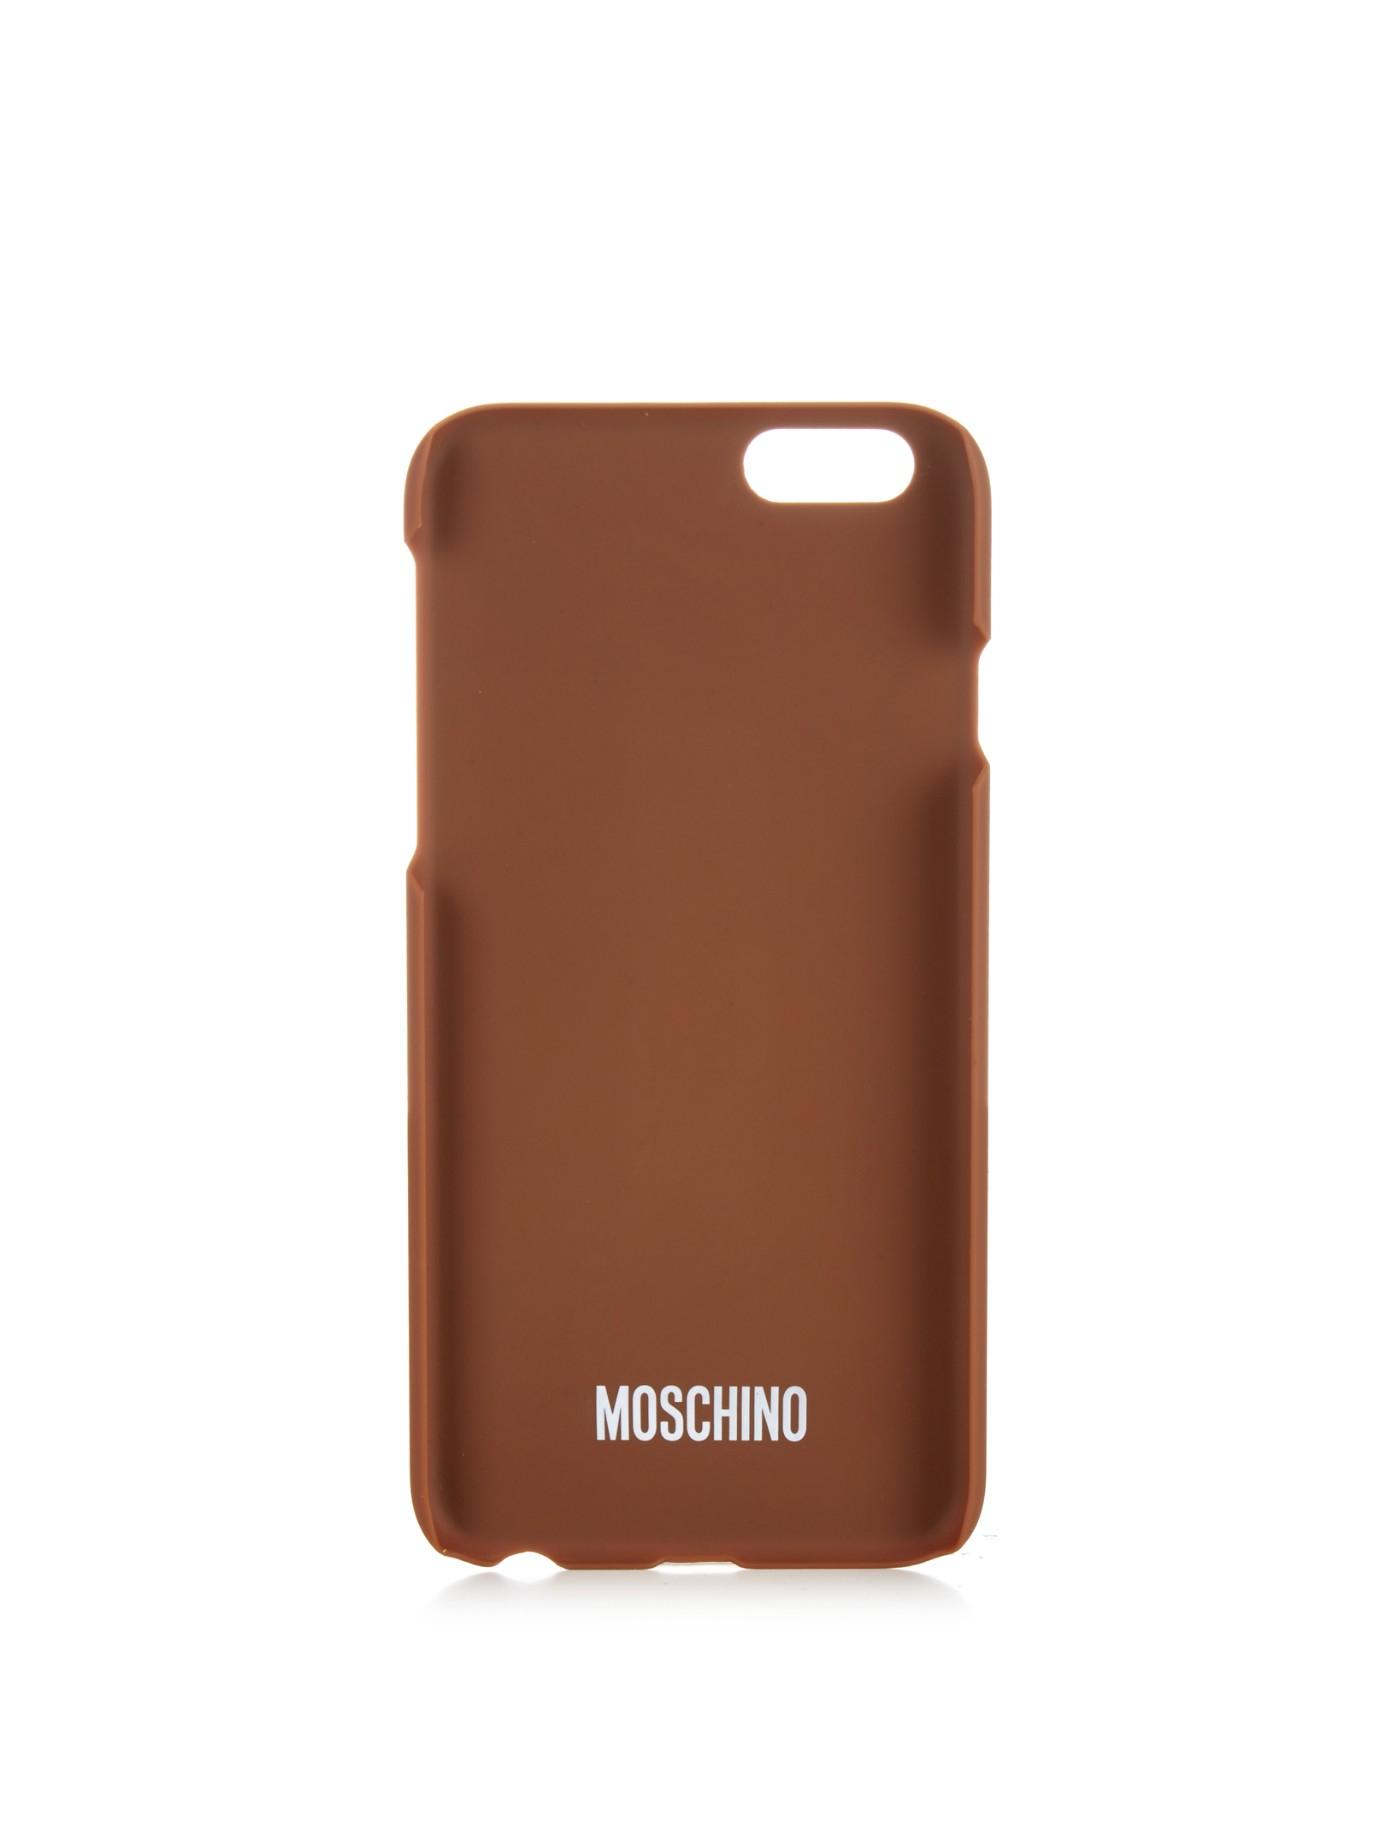 Moschino Iphone Case Teddy